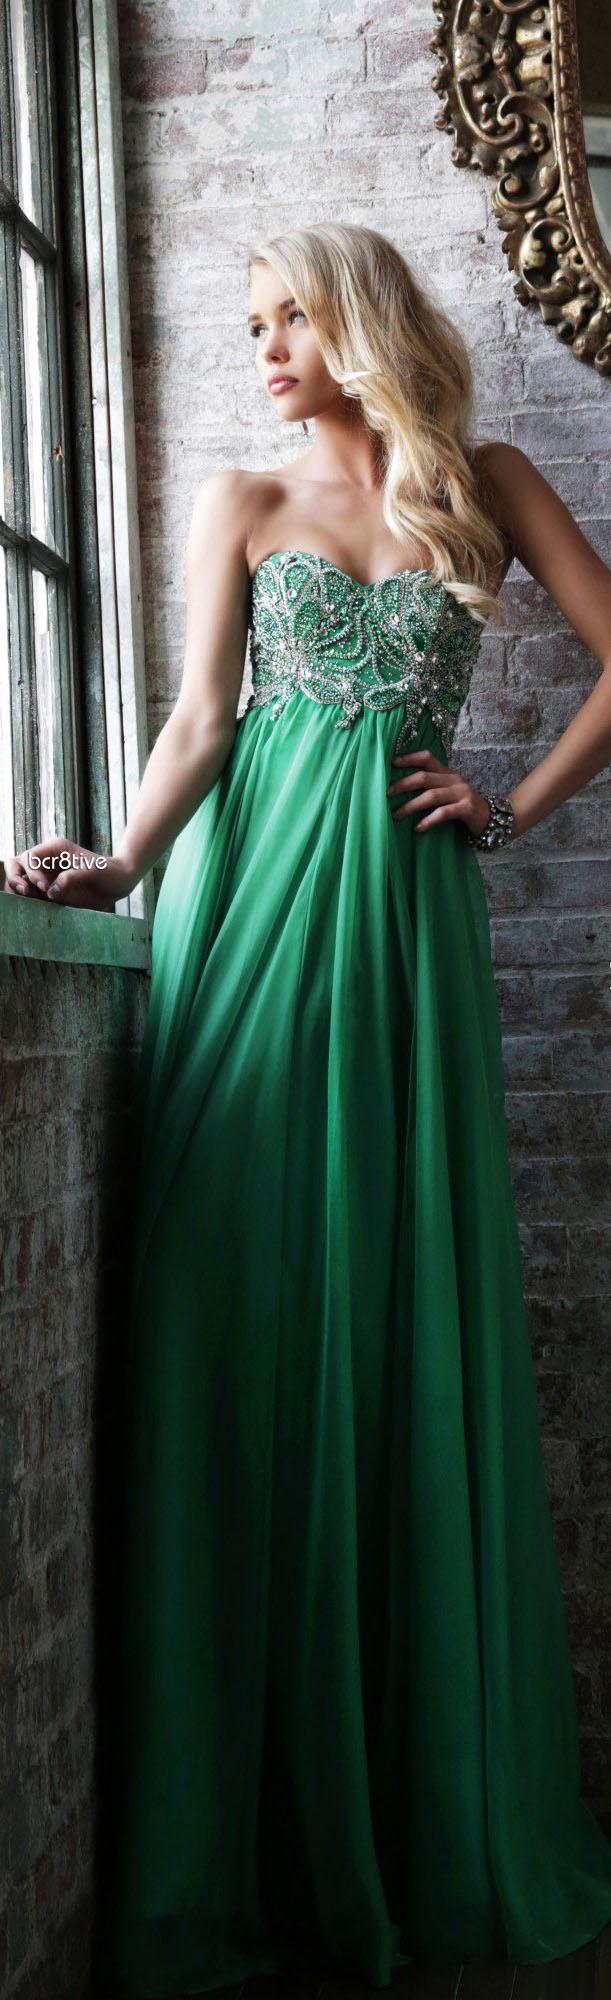 Ensleu | costumes | Pinterest | Tuxedo rental, June 30 and Prom